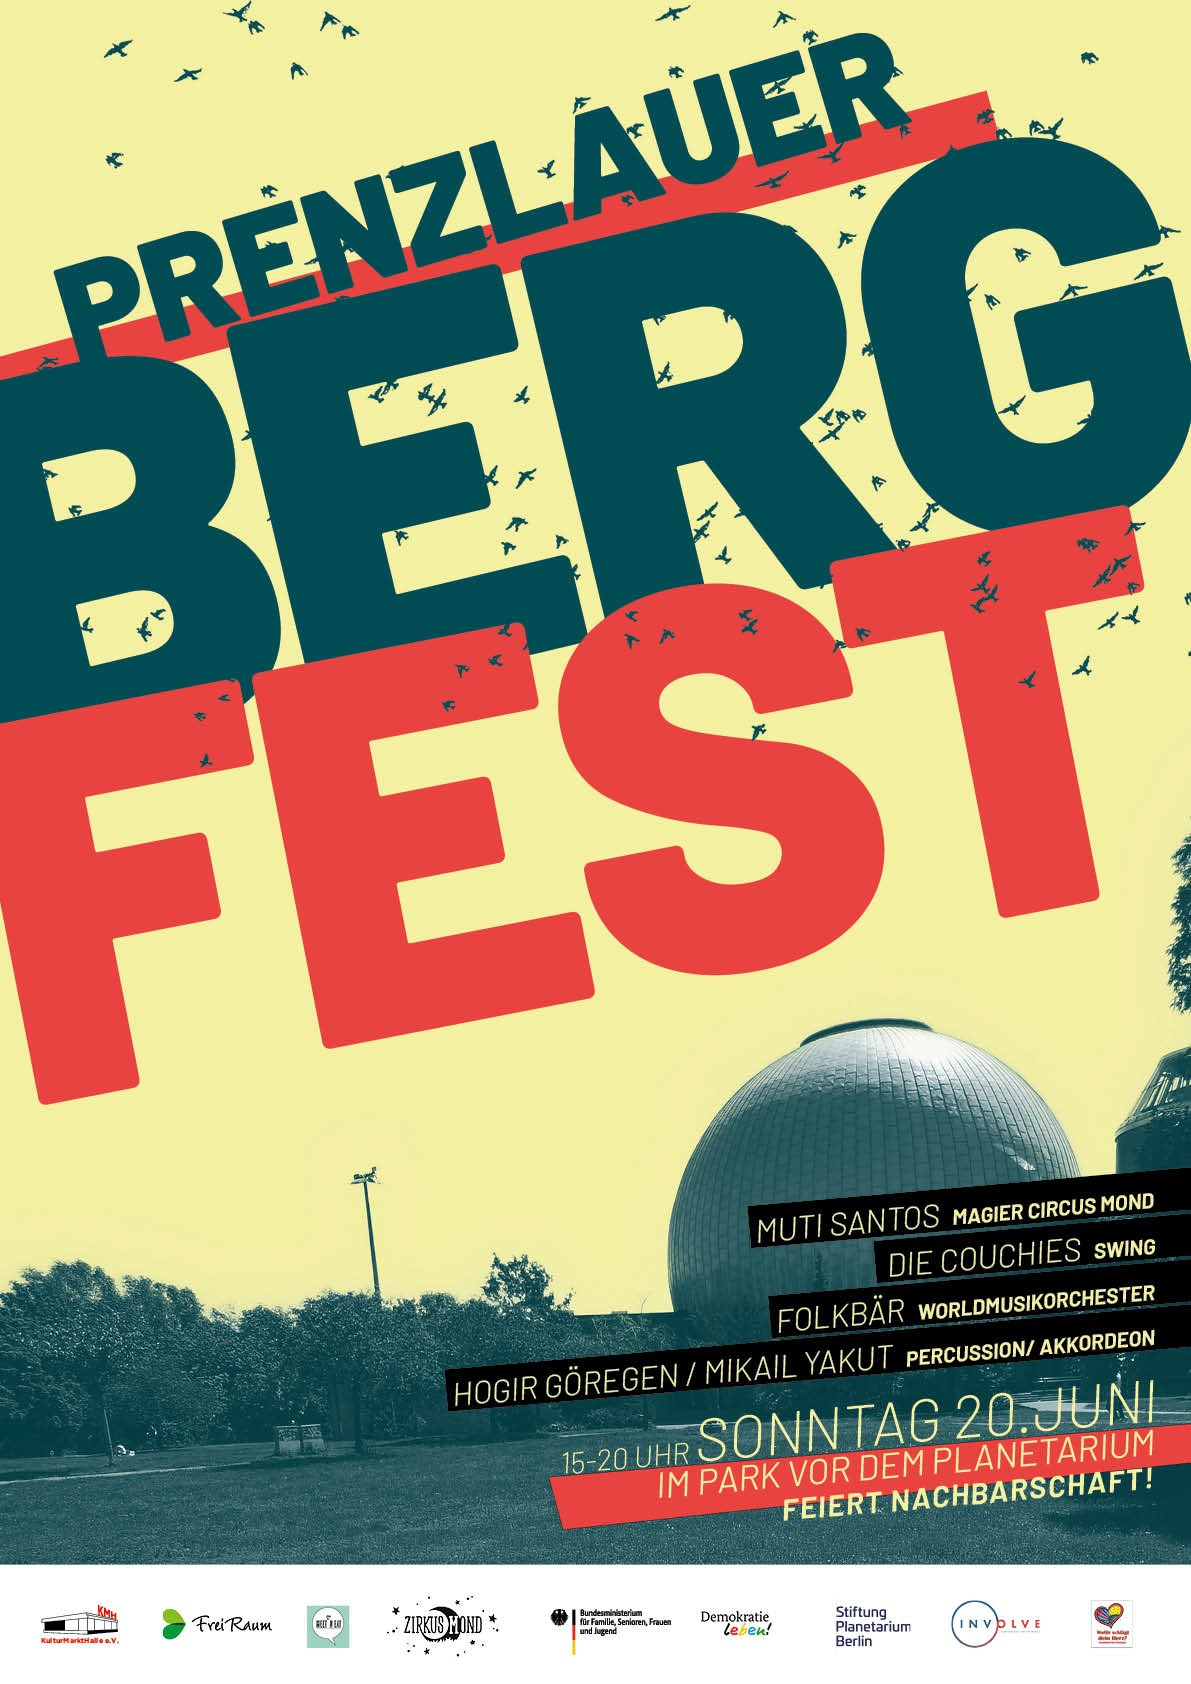 Die Mobile Kiez Tour feiert Prenzlauer Berg fest mit.